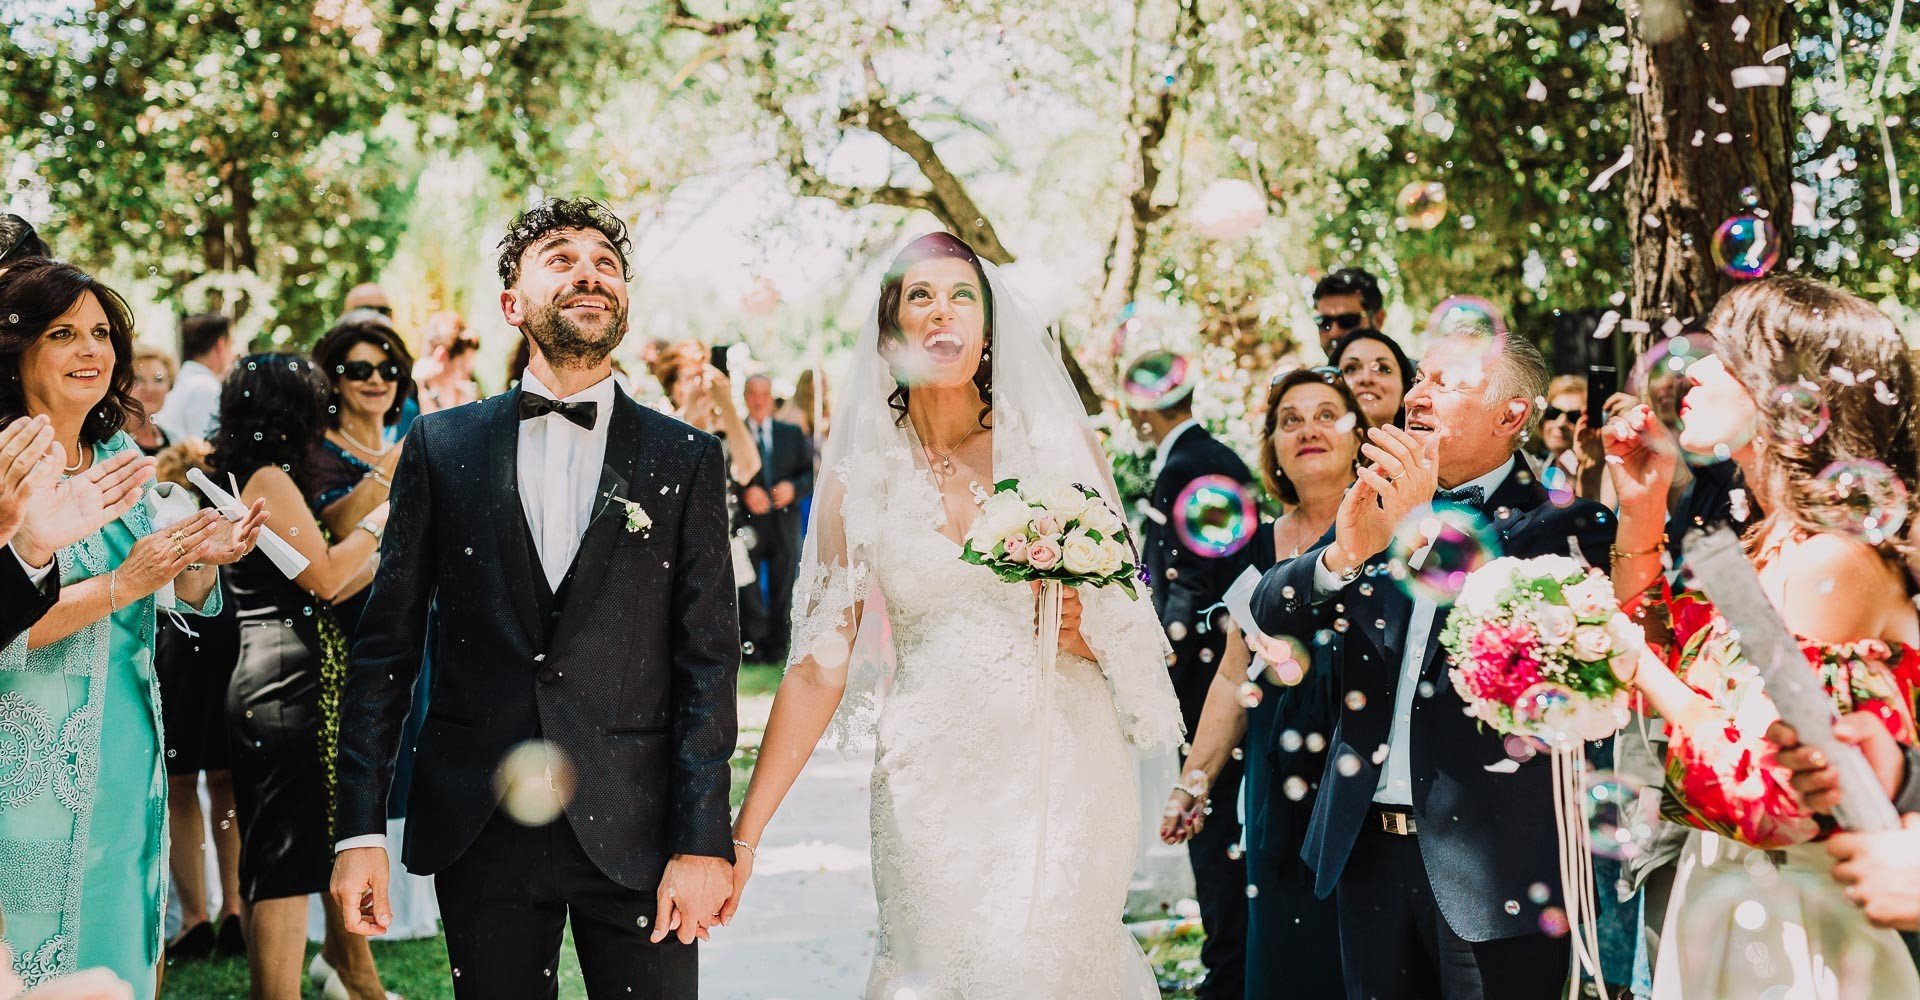 Matrimonio Lago Toscana : Reportage matrimonio puglia toscana amalfi lago di como